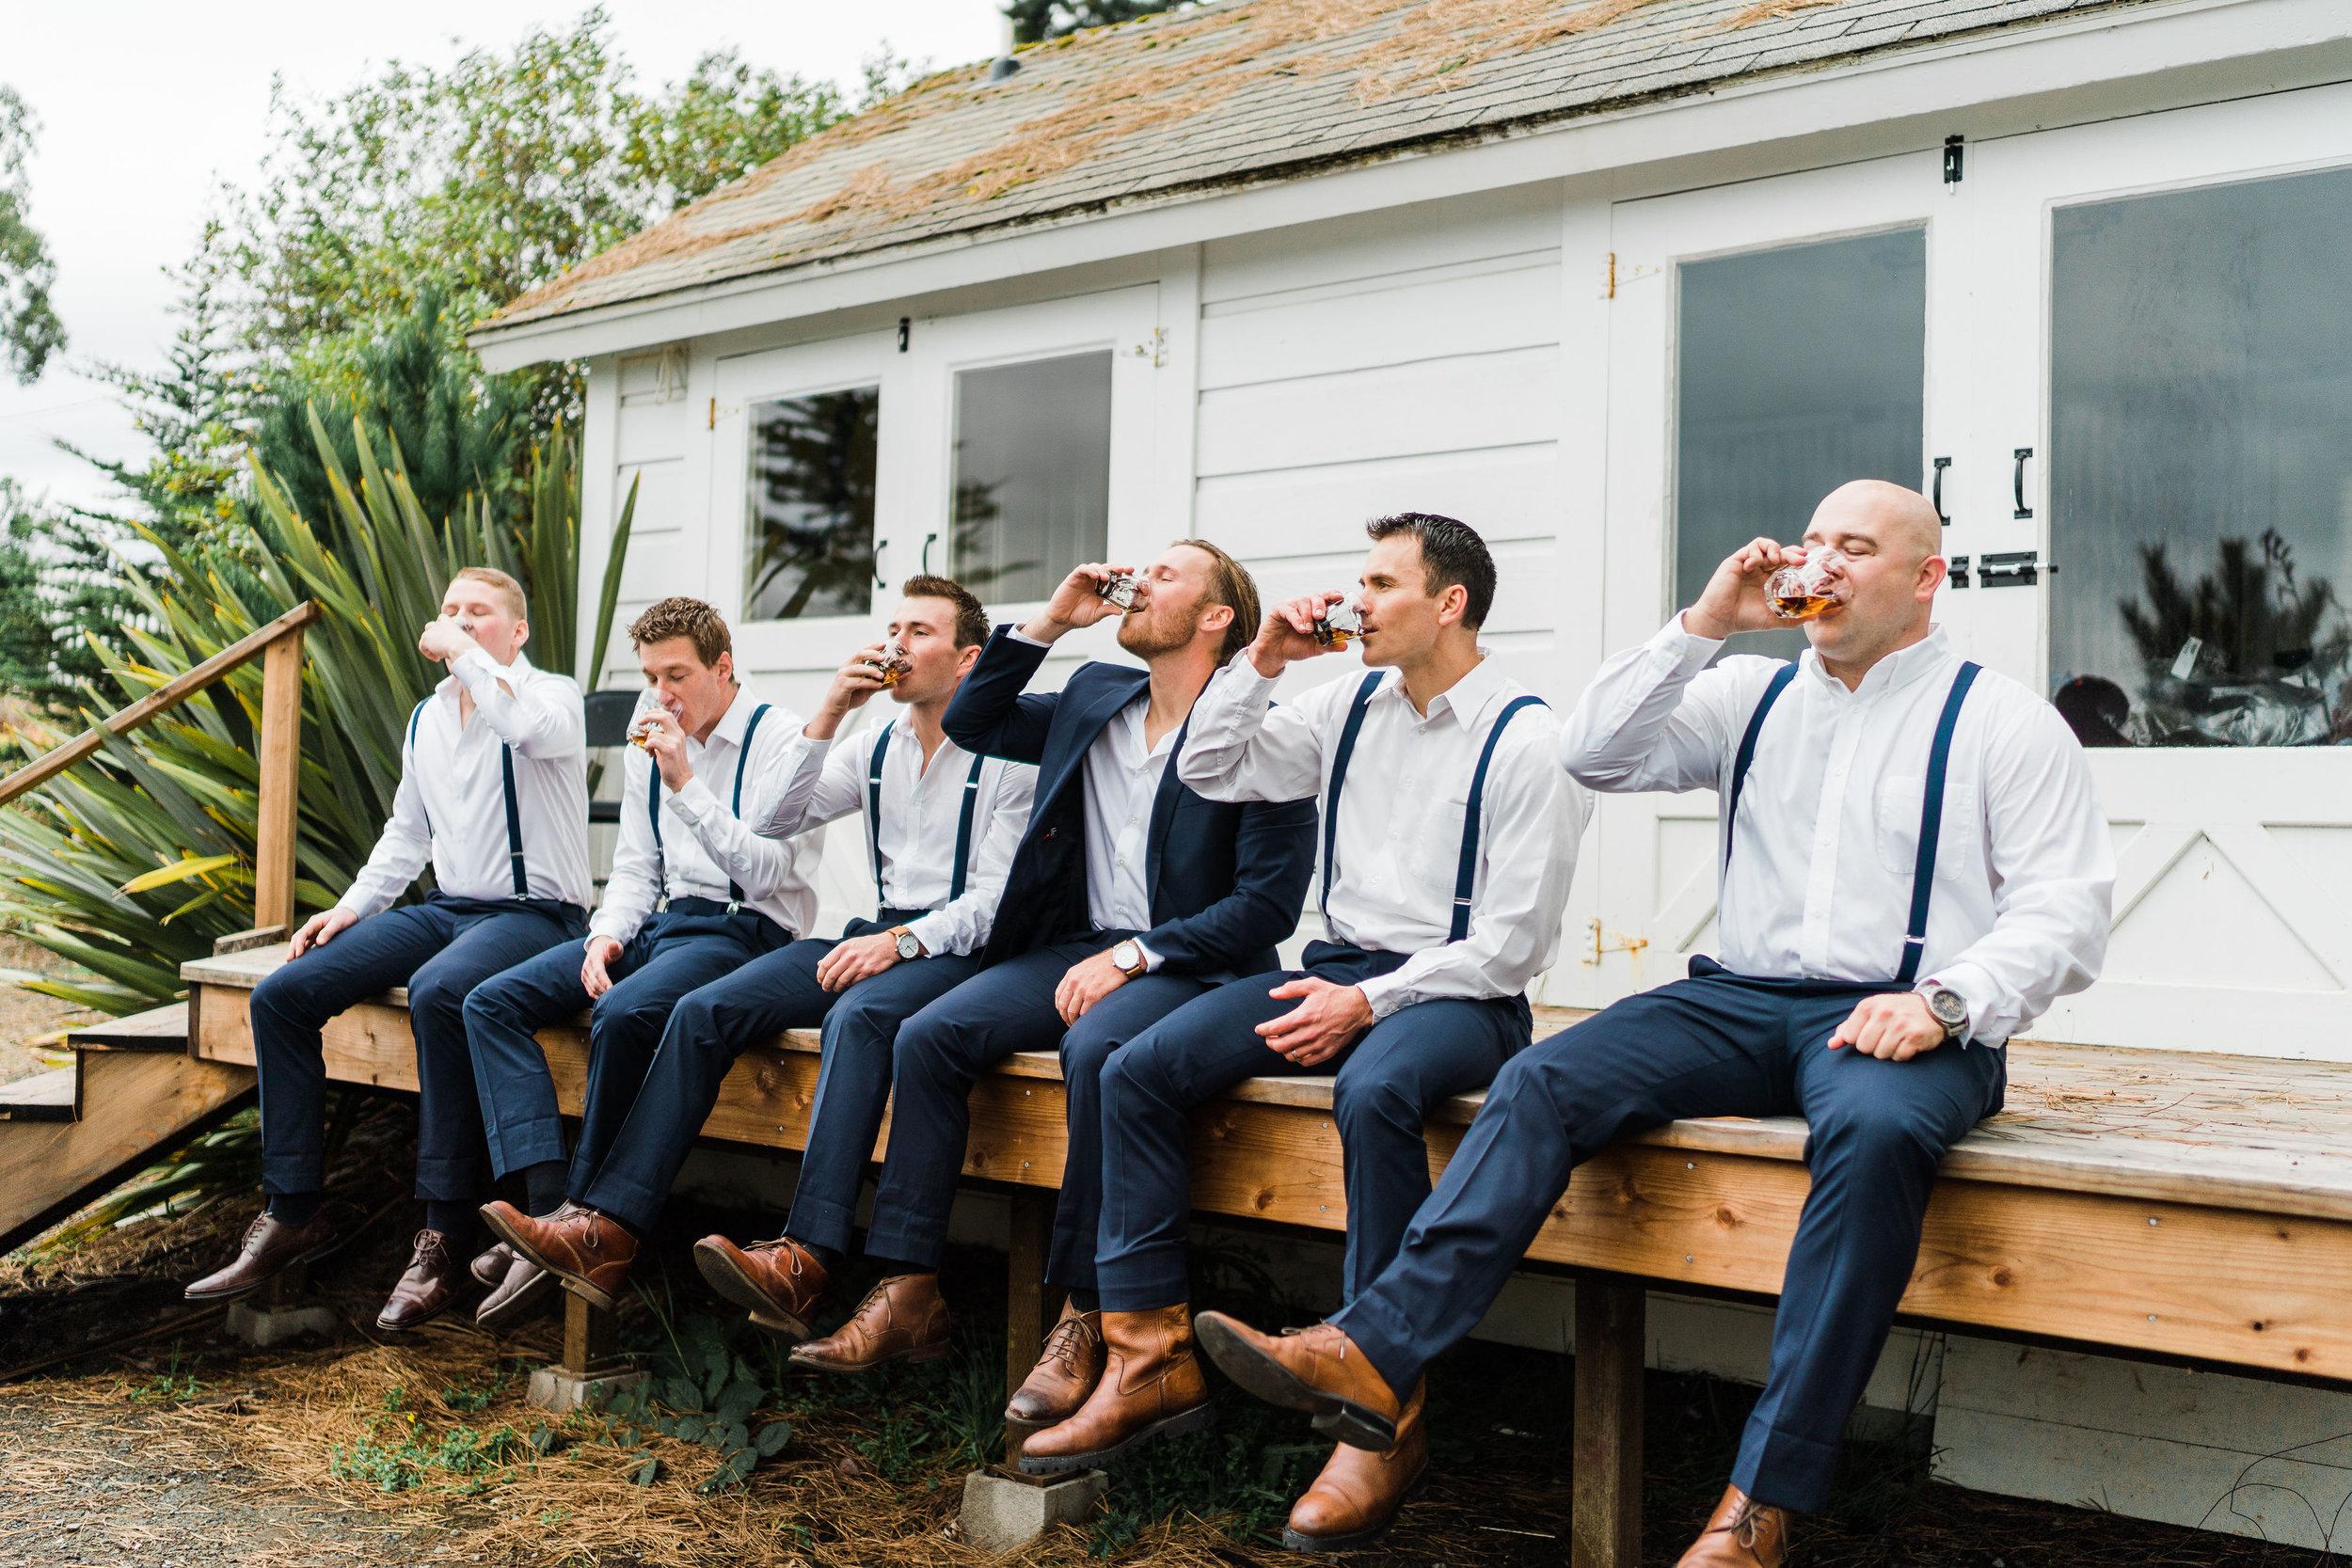 switzer-farm-wedding-westport-brandon-bibbins-photograhy-fine-art-027.jpg